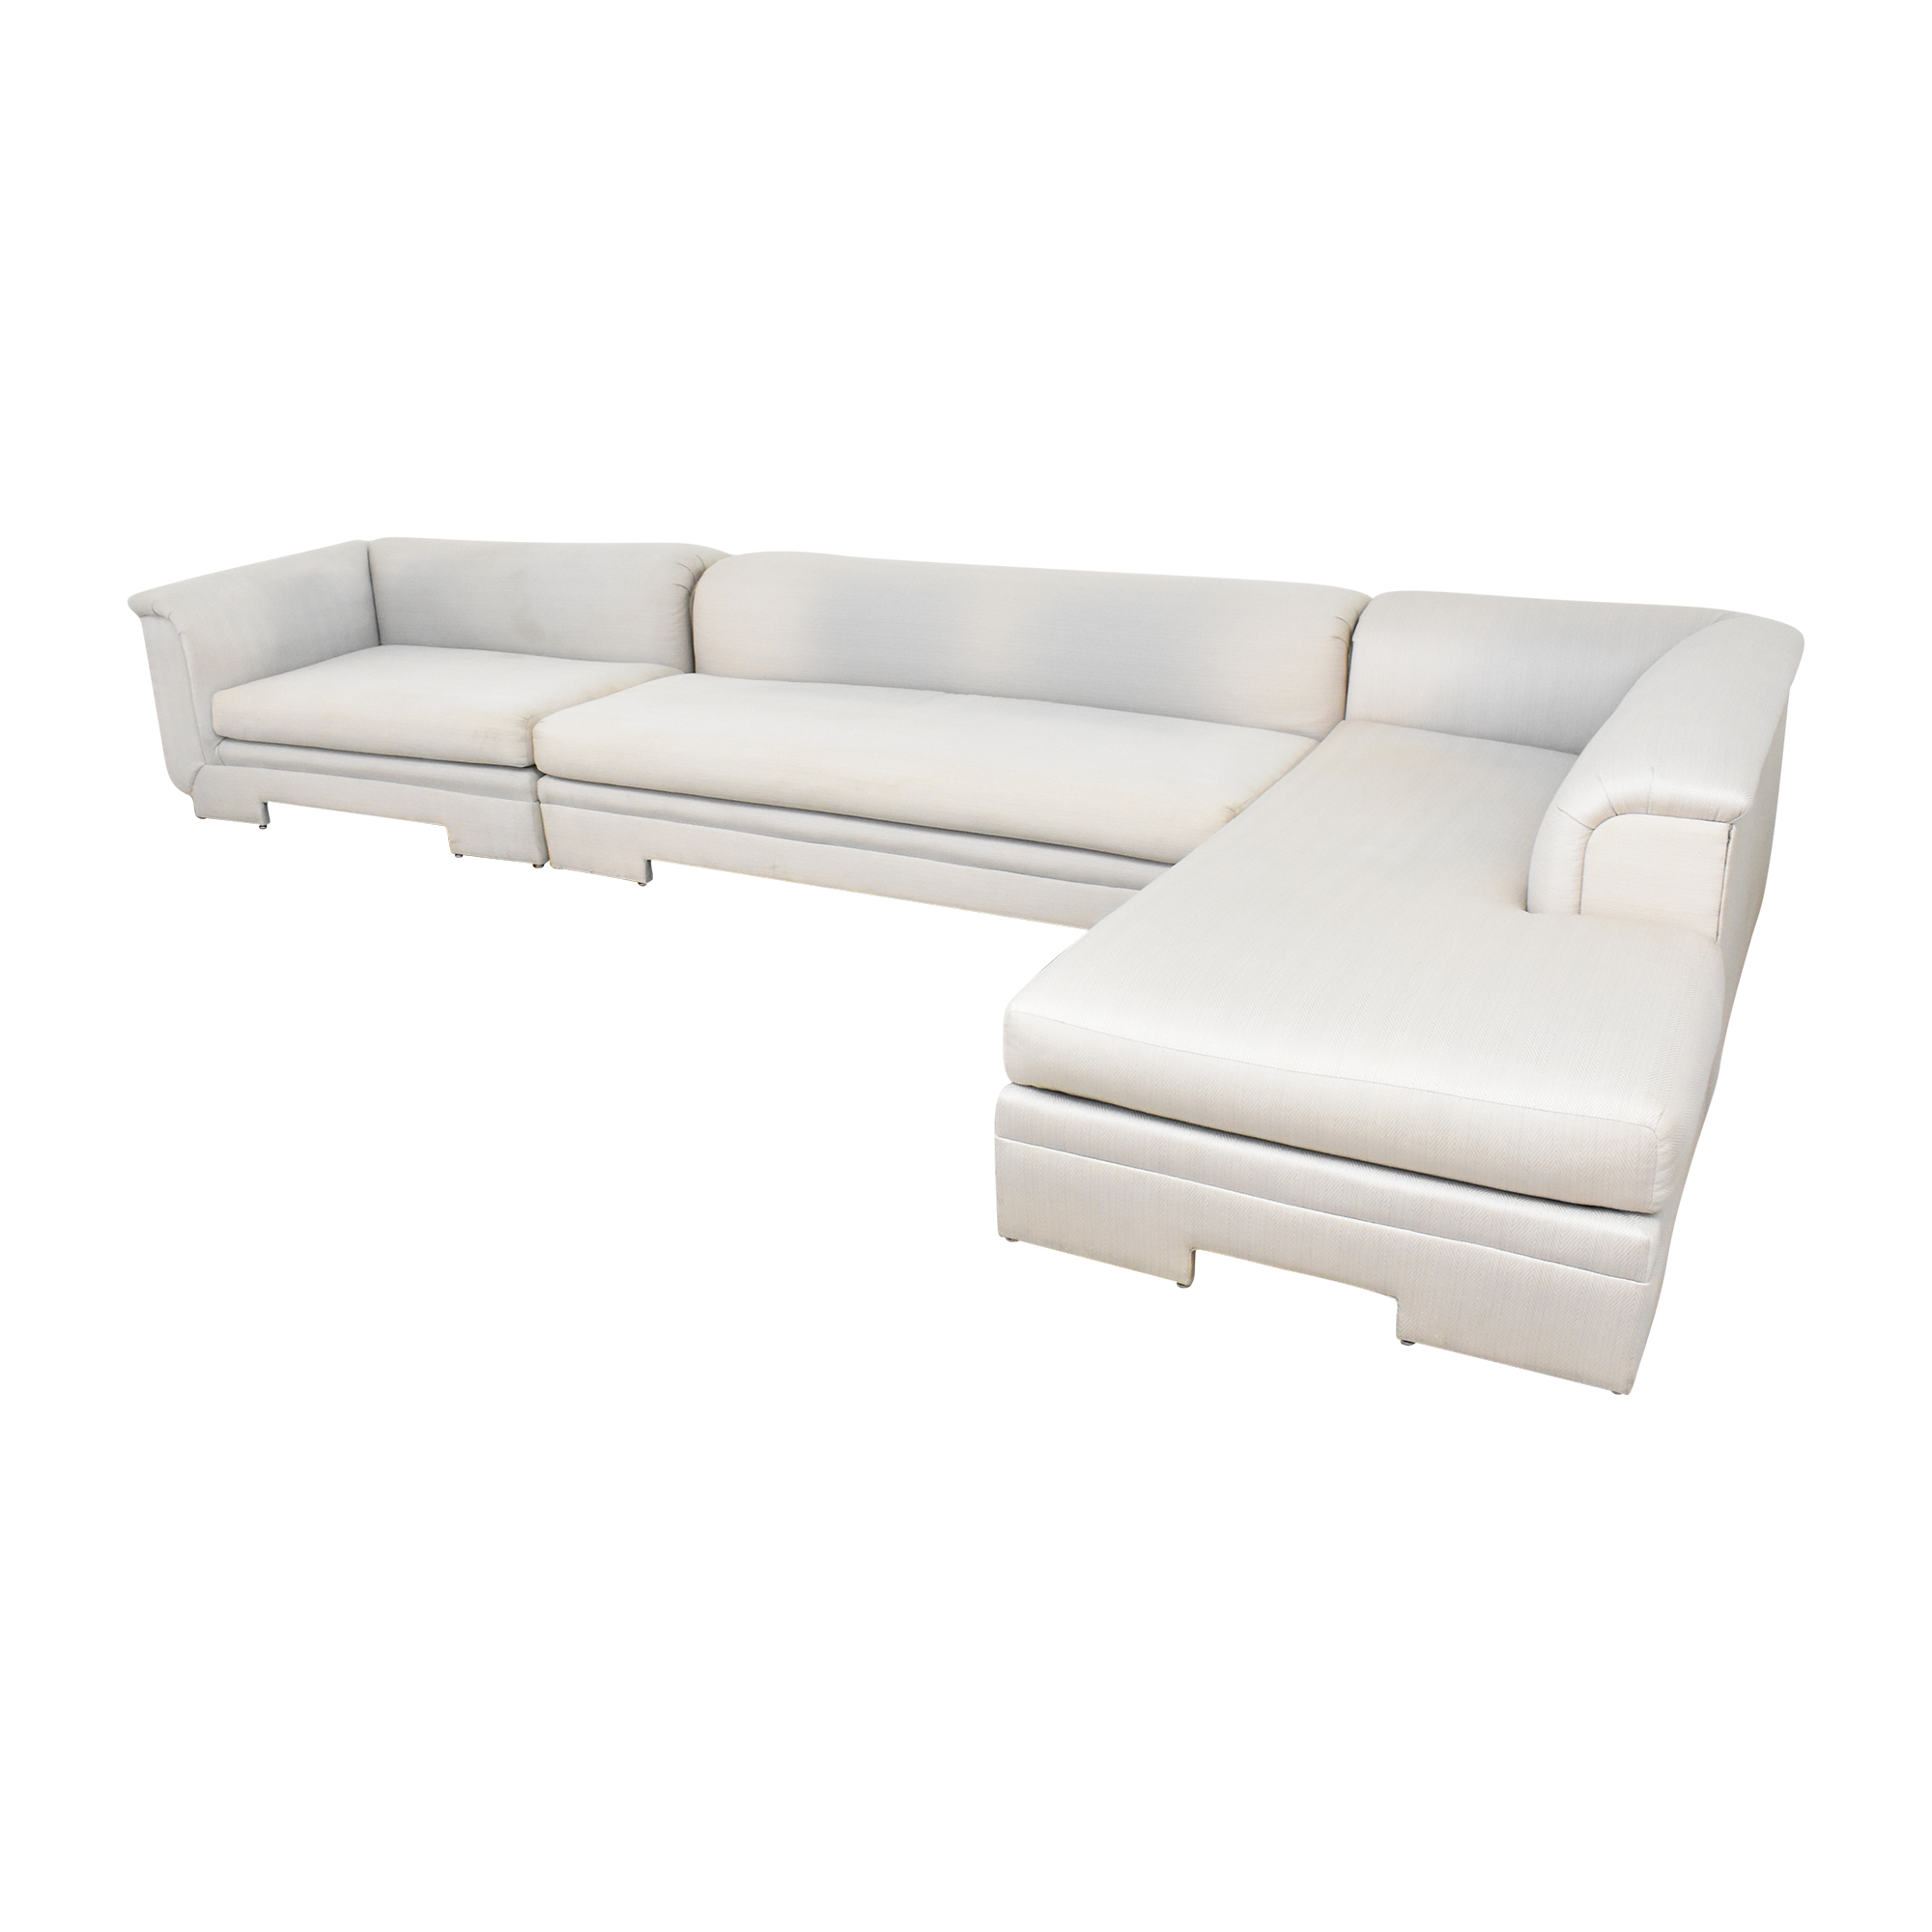 shop Avento Designs Modern Three Piece Chaise Sectional Sofa Avento Designs Sectionals